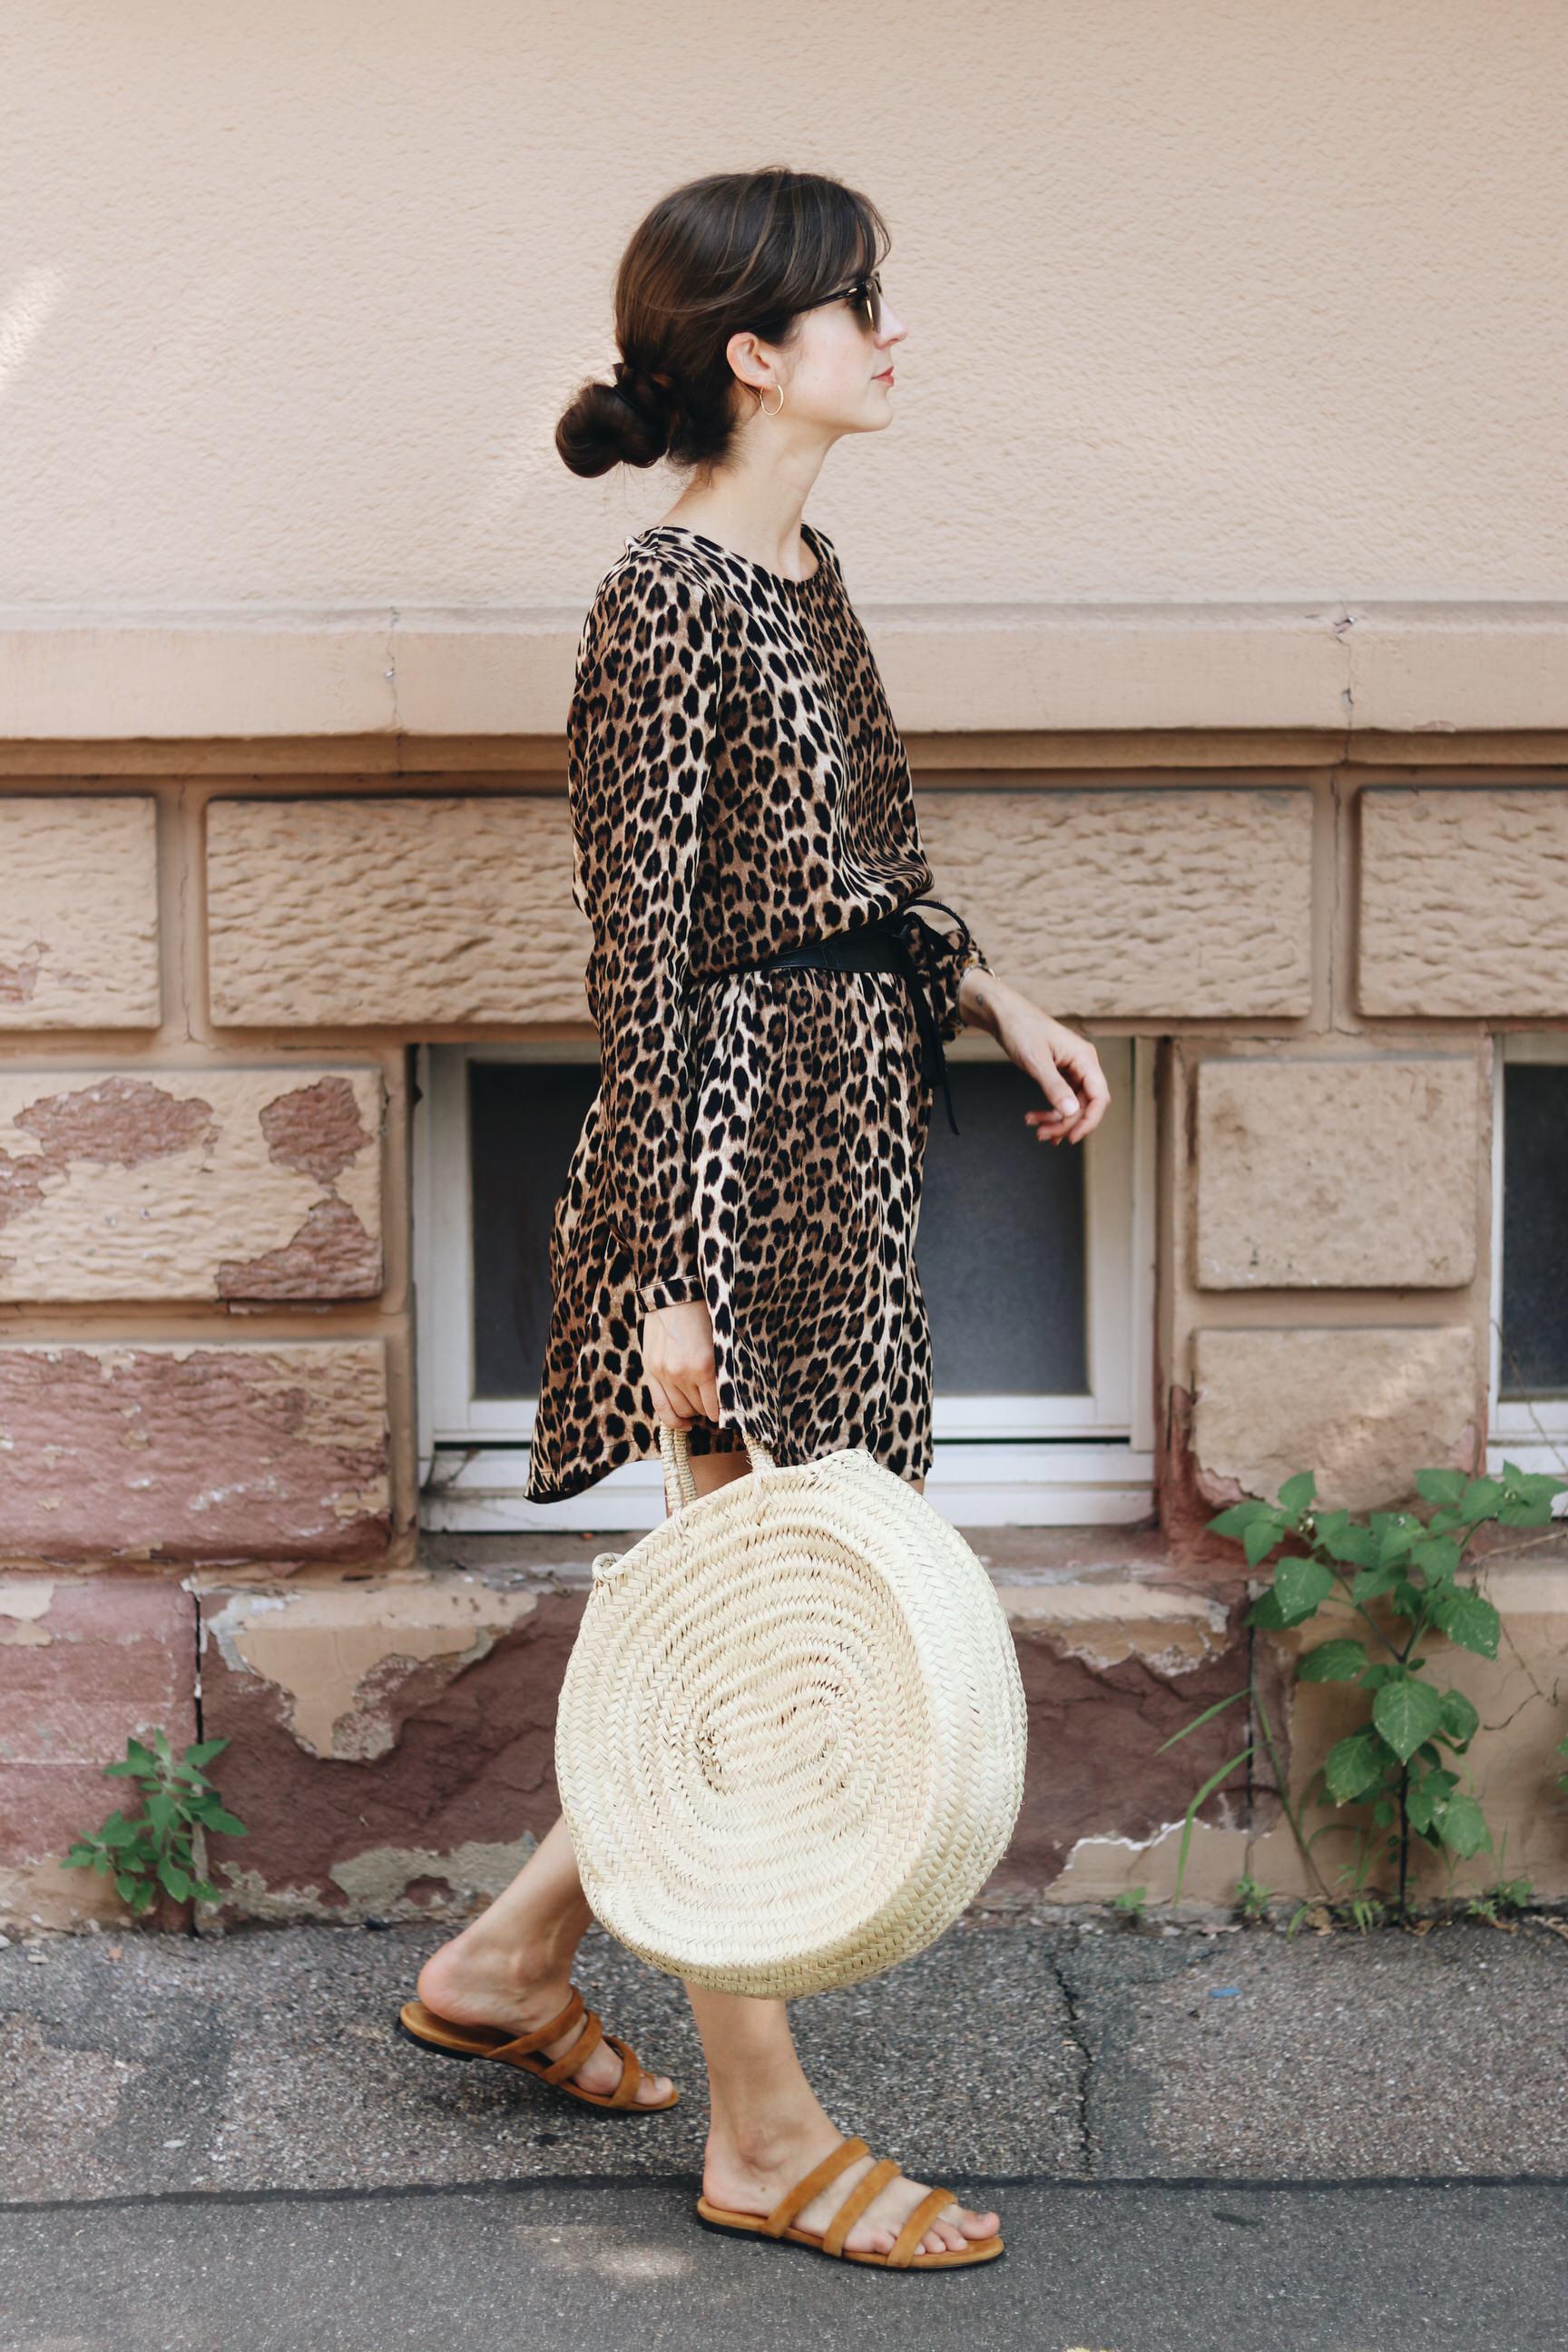 Modebloggerin Neele Outfit Streetstyle Leo Print Korbtsche Taschentrends Aeyde Sandalen Sommer